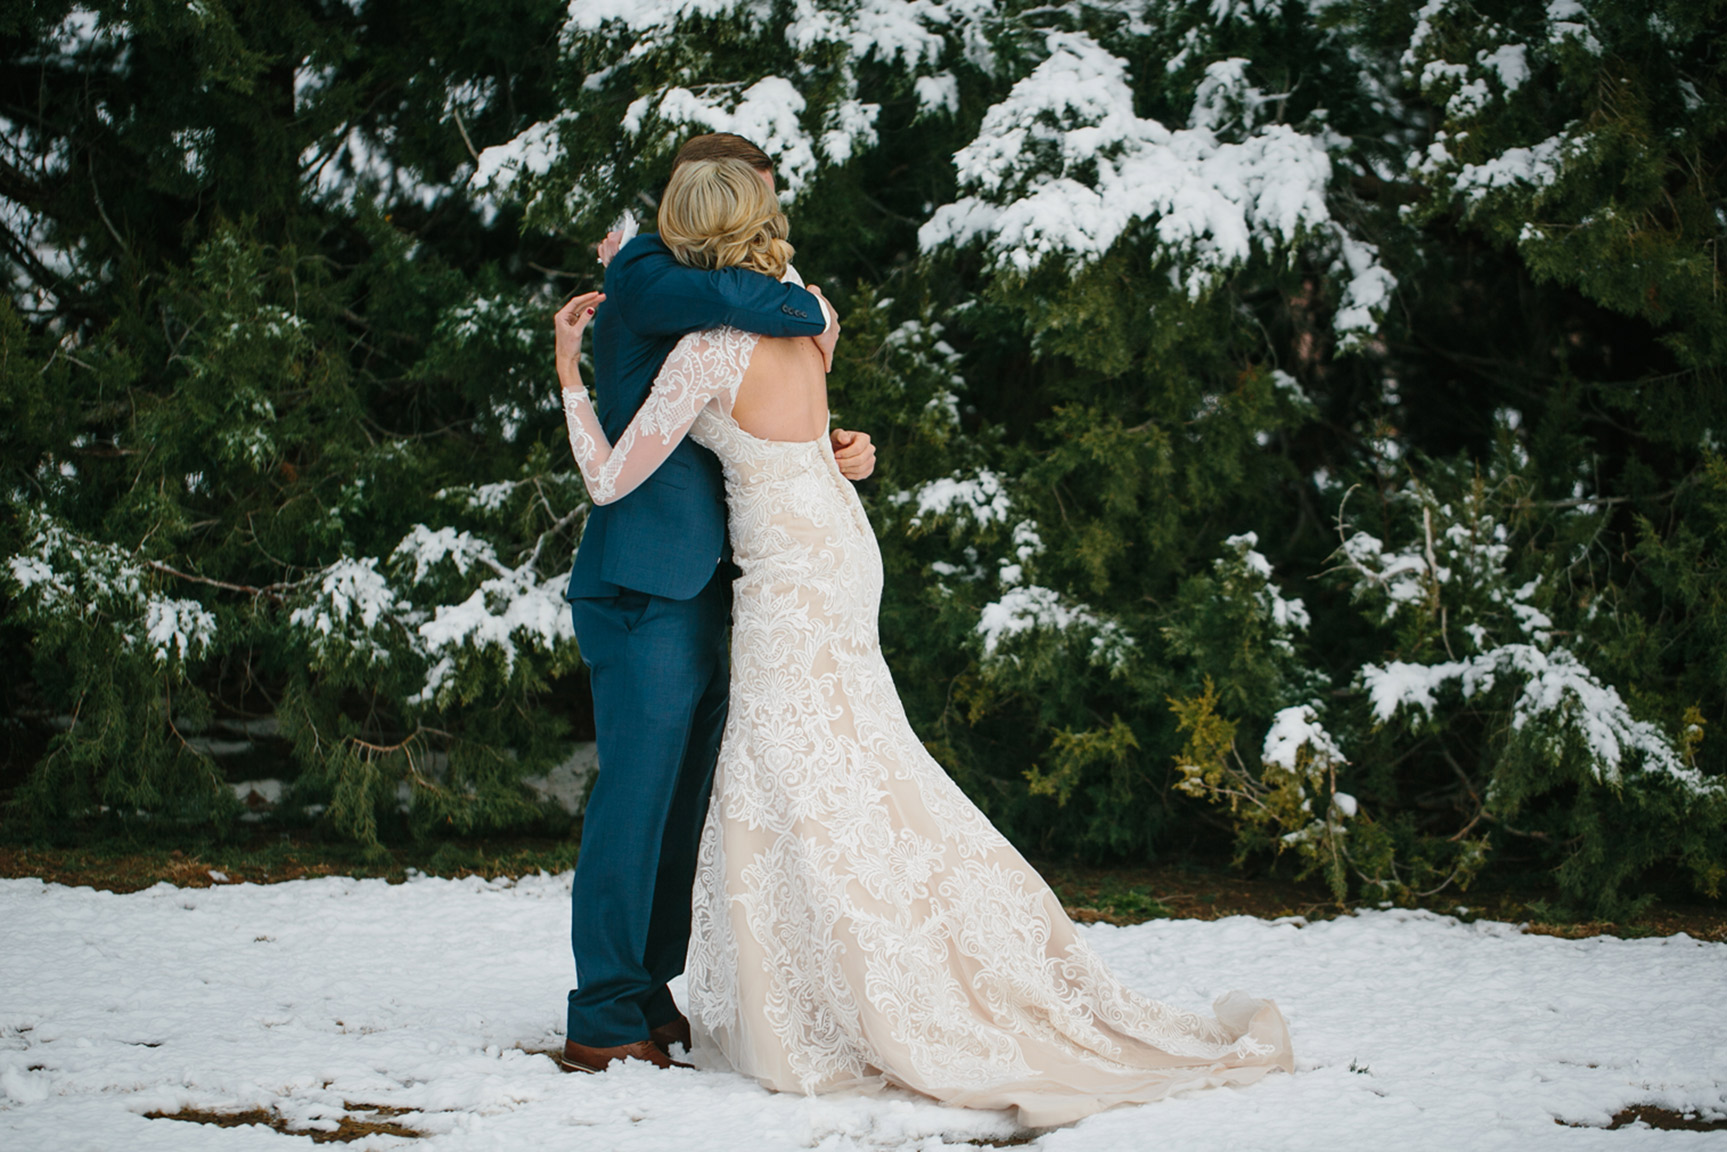 Cotton_Creek_Barn_Winter_Wedding_WeddingPhotographer020.jpg